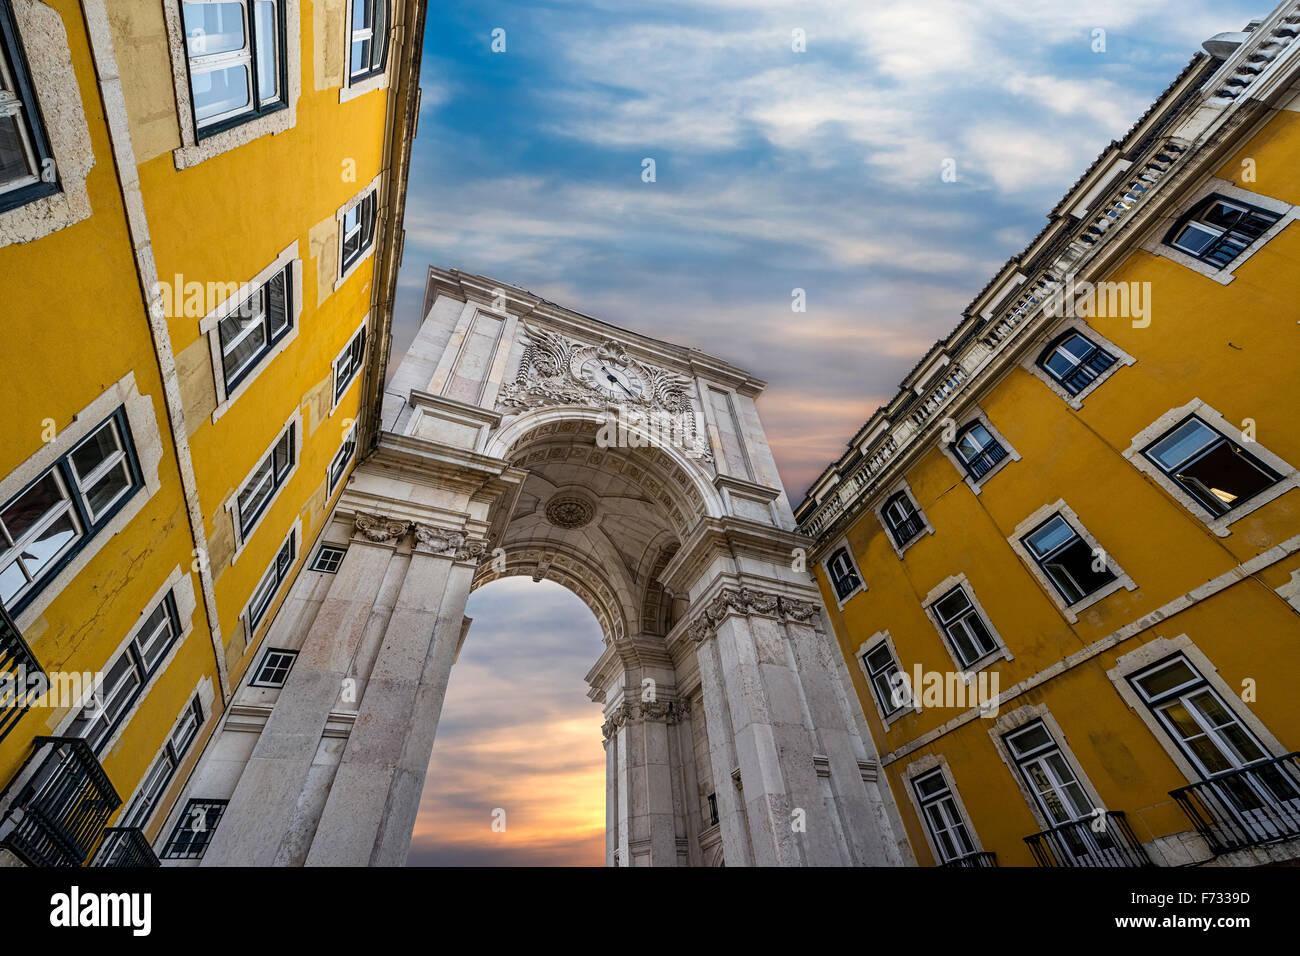 Triumphal Arch in the Rua Augusta, Lisbon, Portugal - Stock Image